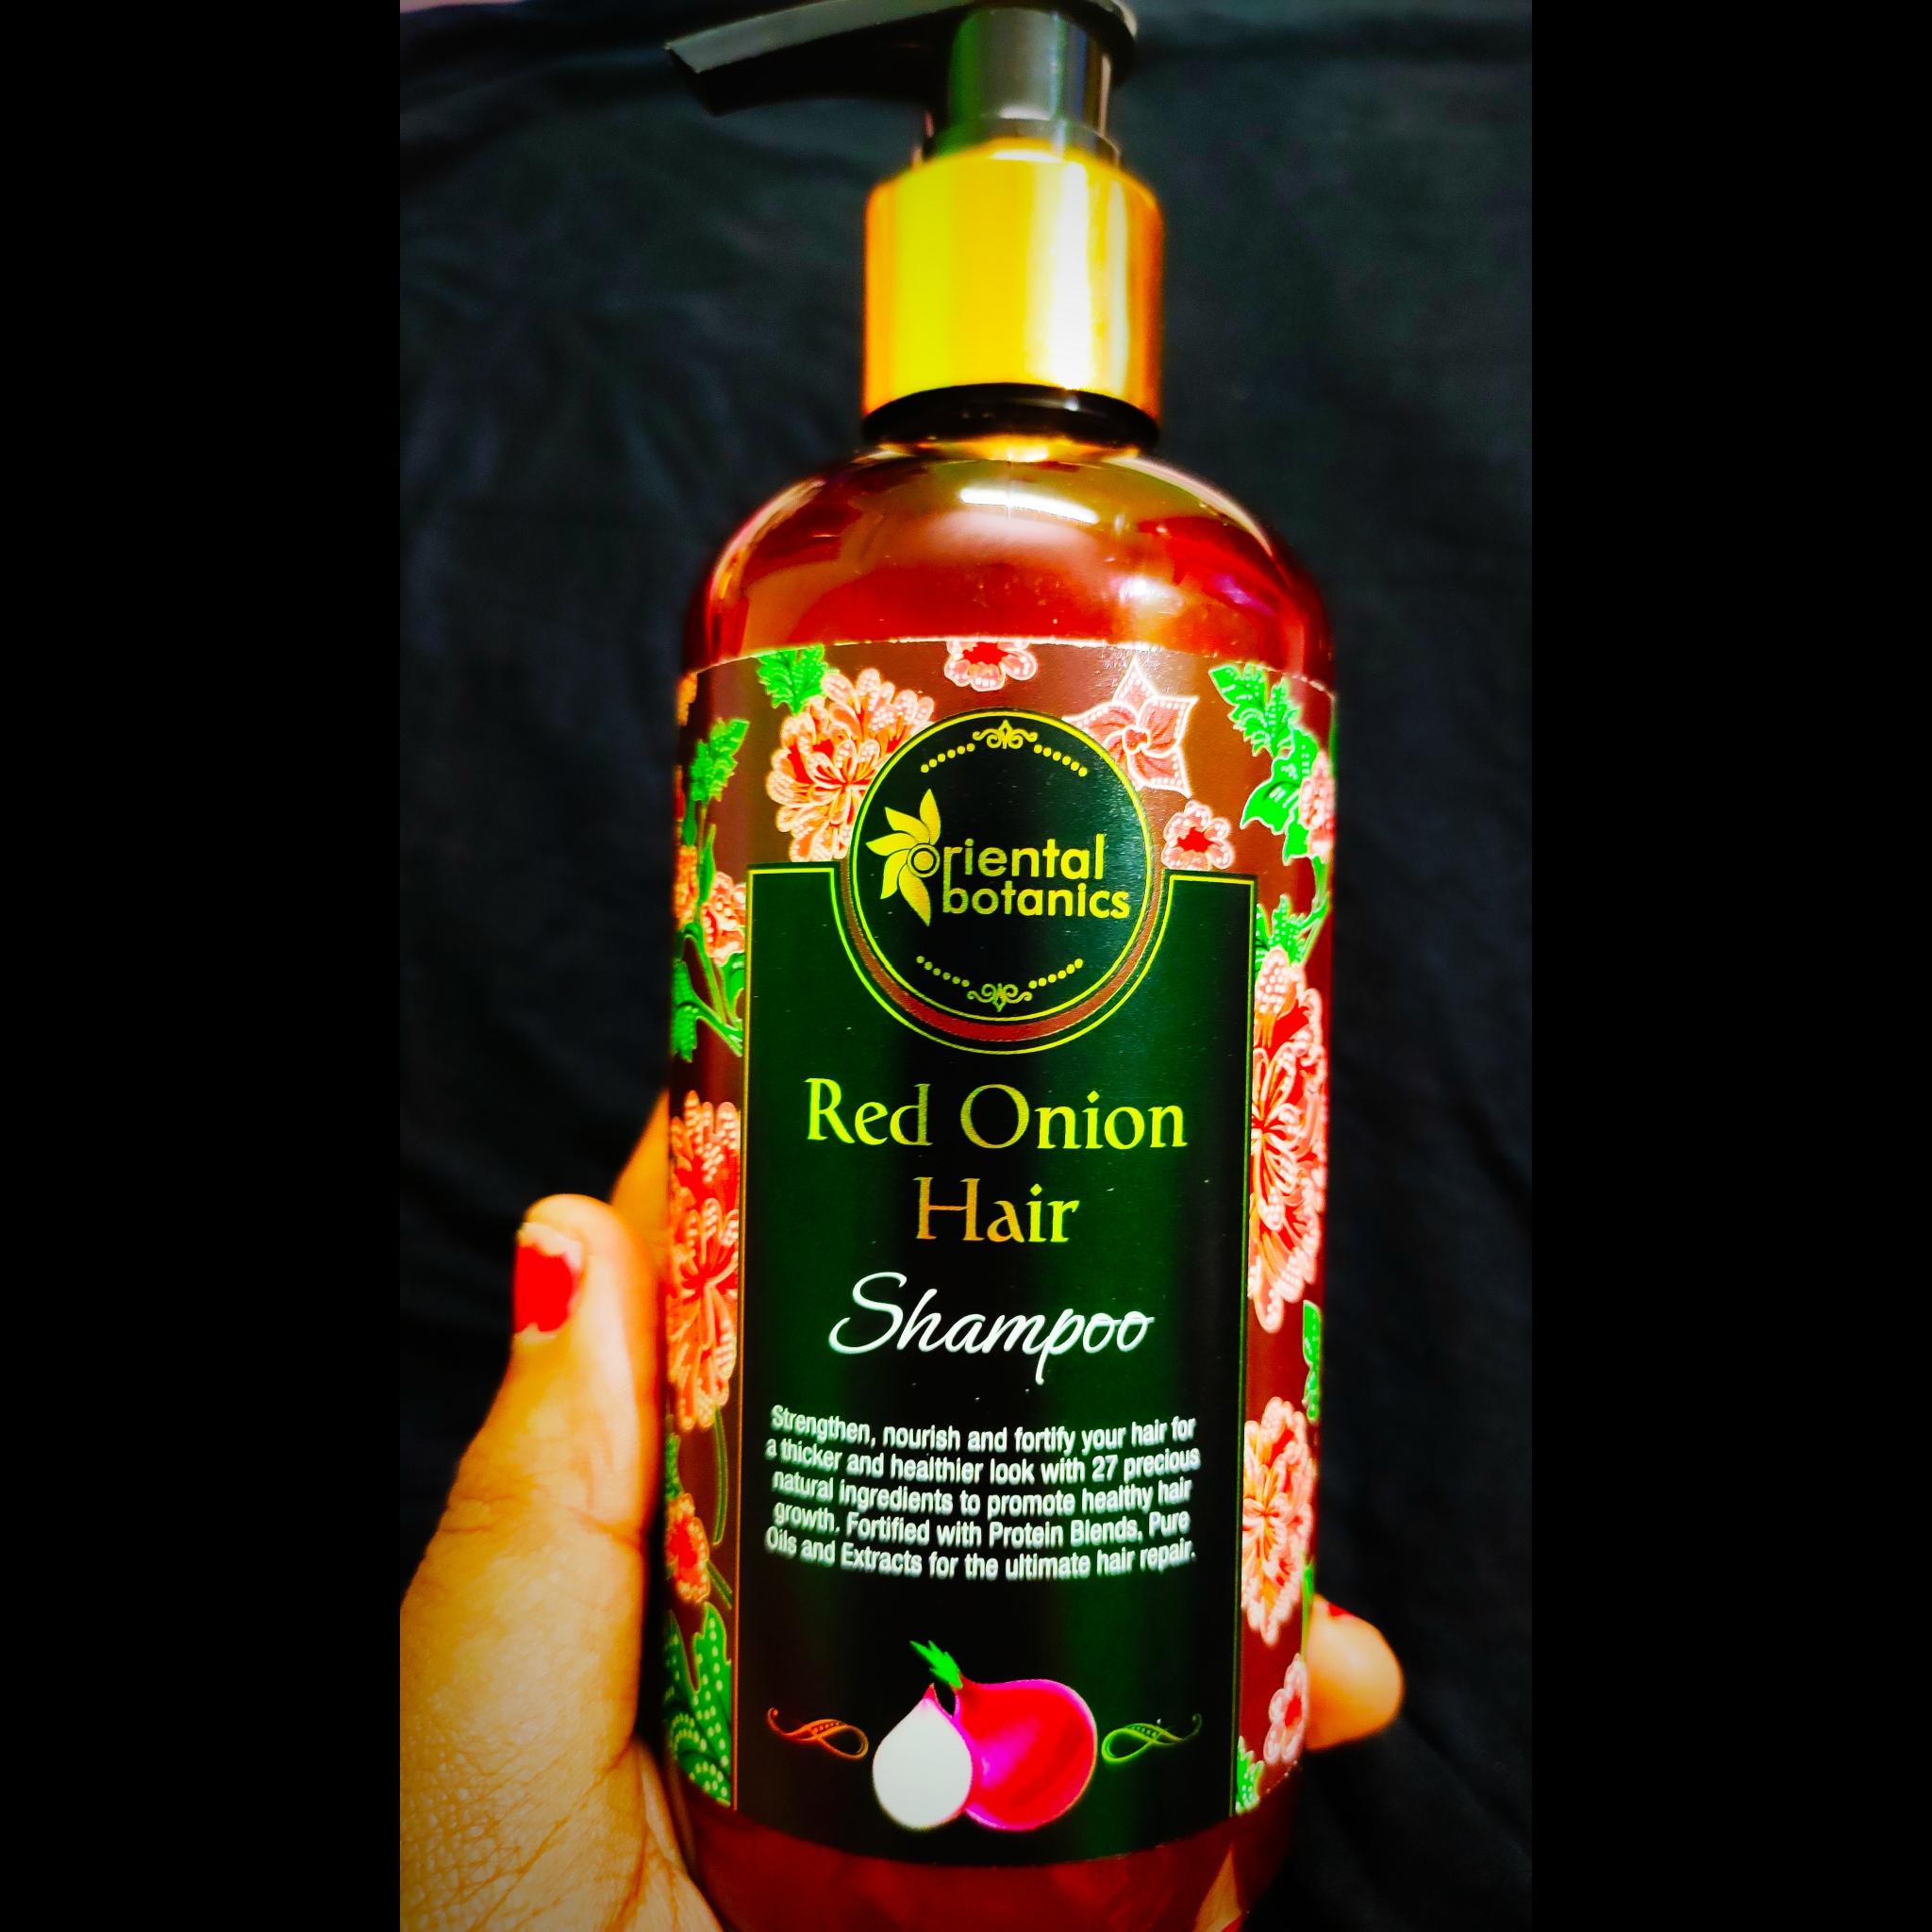 Oriental Botanics Red Onion Hair Shampoo-Amazing Shampoo for Hair Nourishment-By anushreedhar